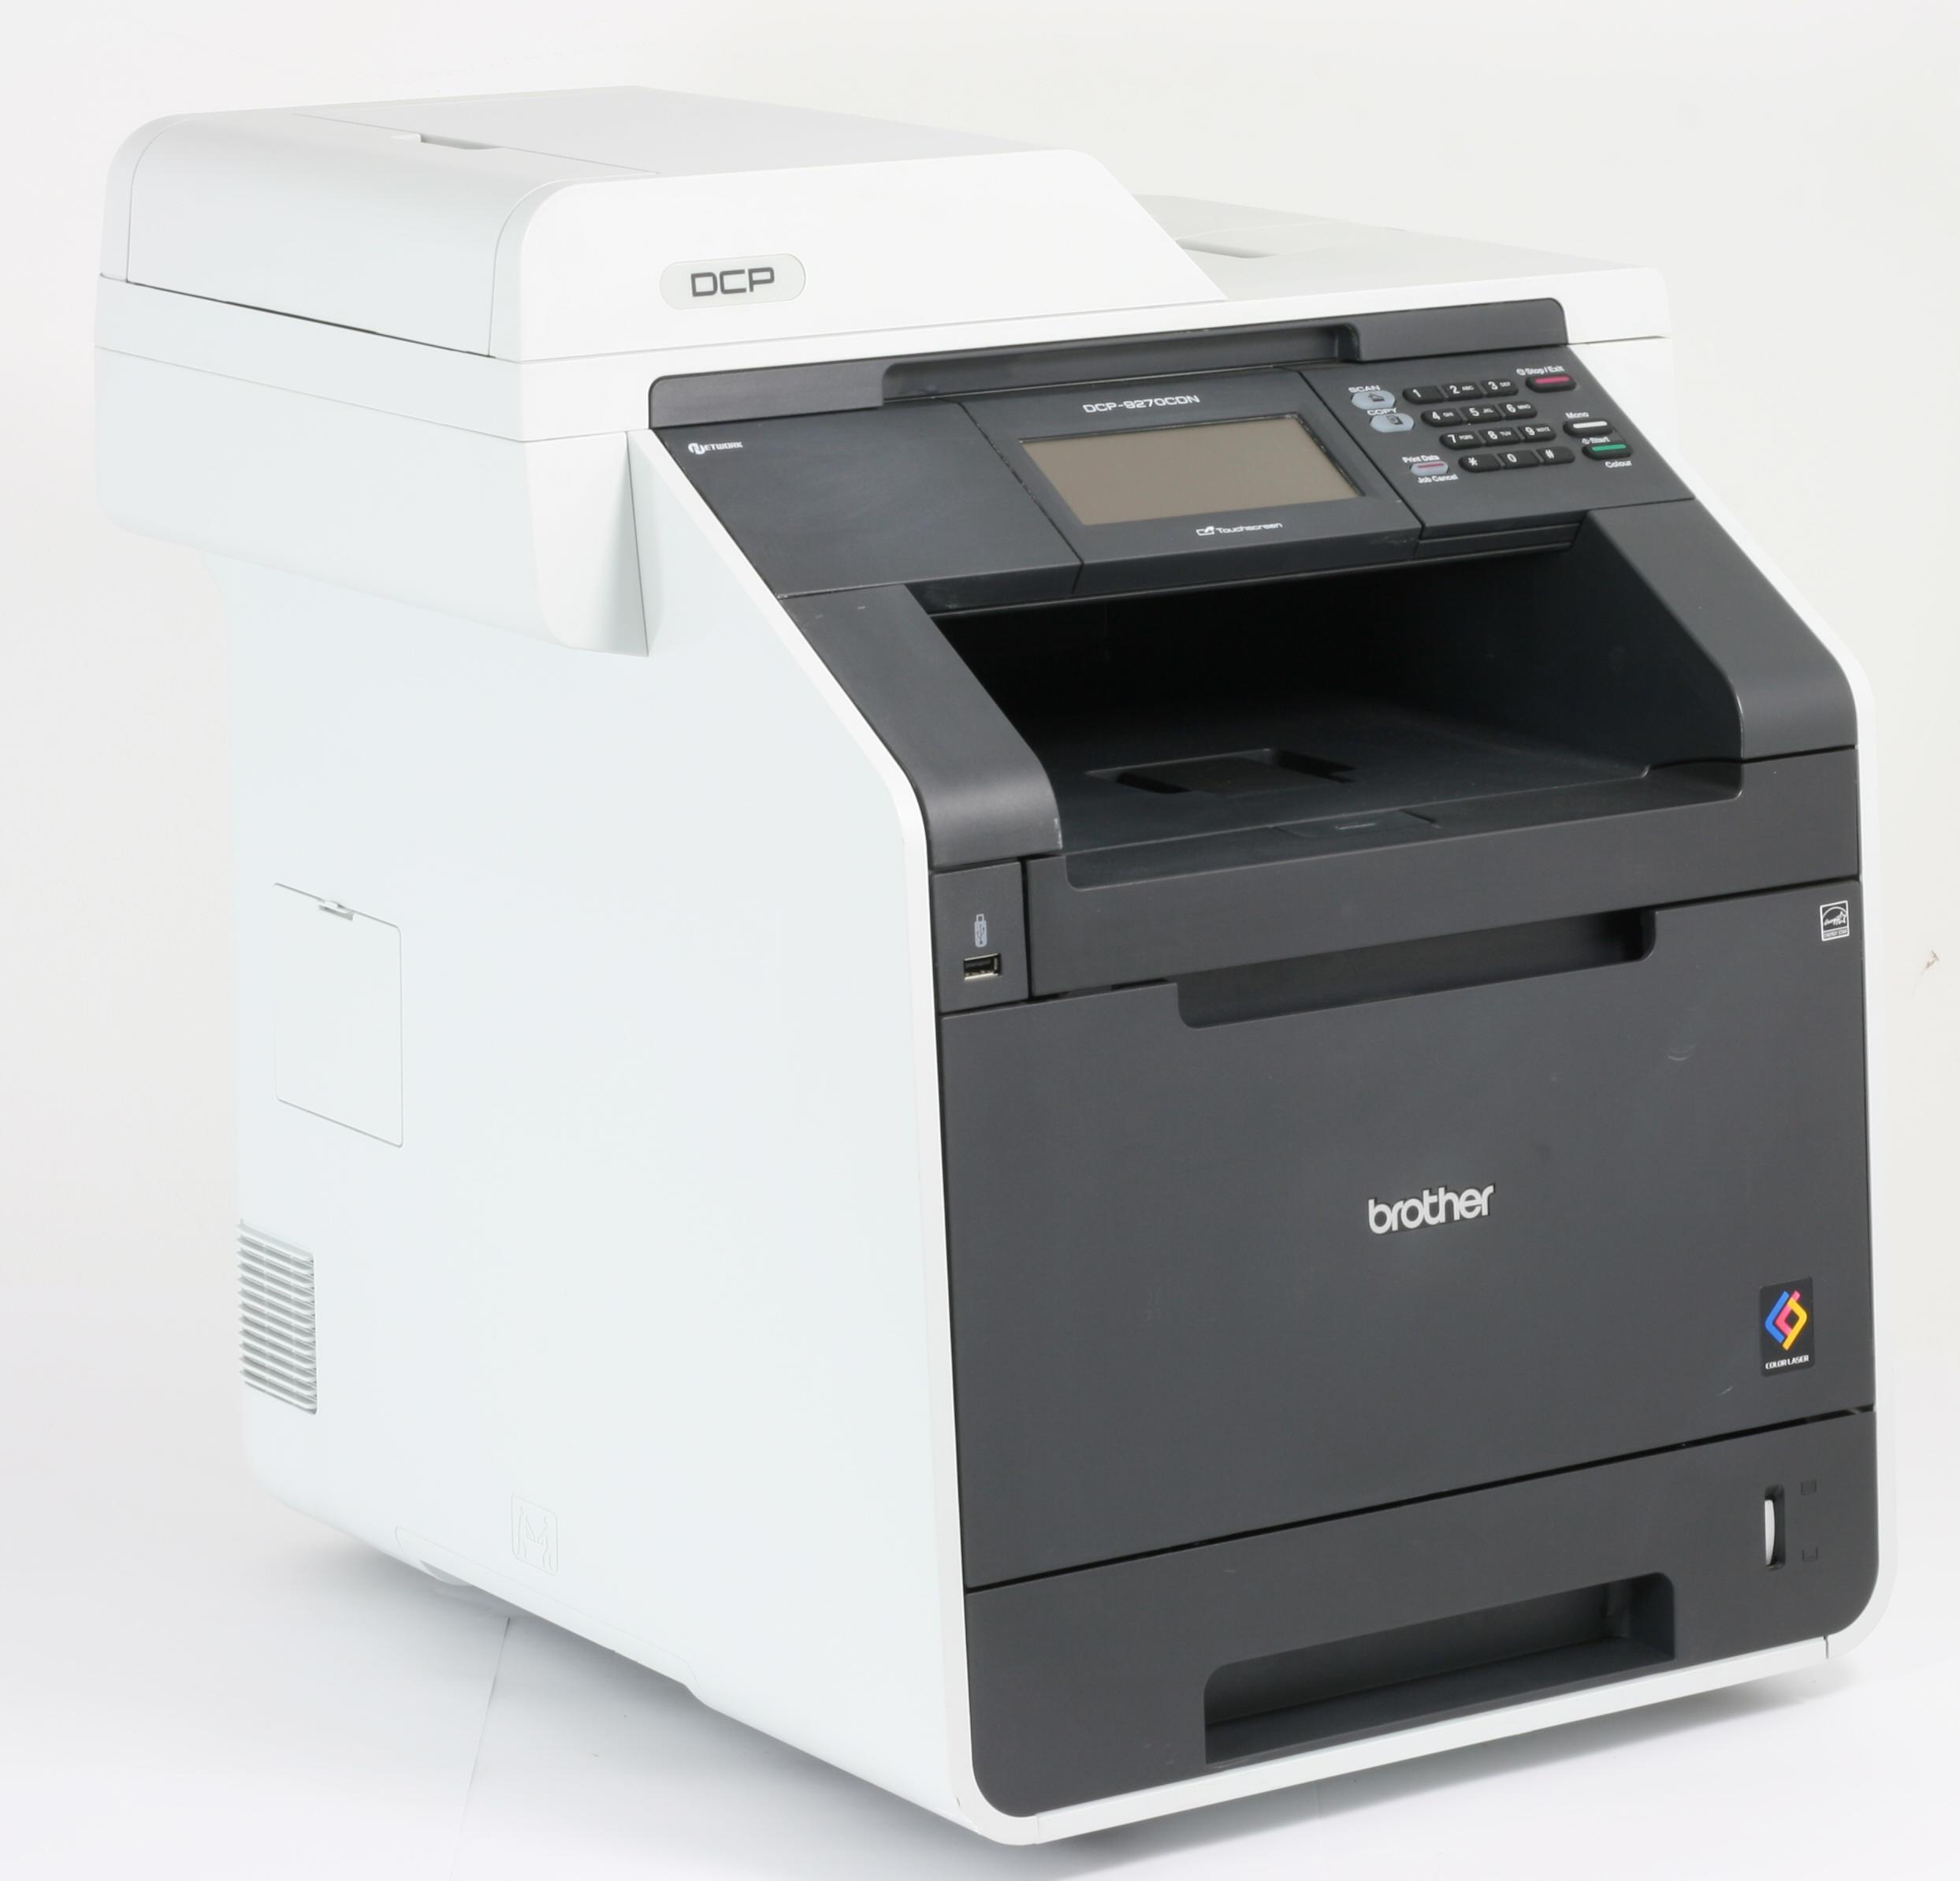 Brother Drucker DCP-9270CDN Laserdrucker Kopierer Scanner Color gebraucht